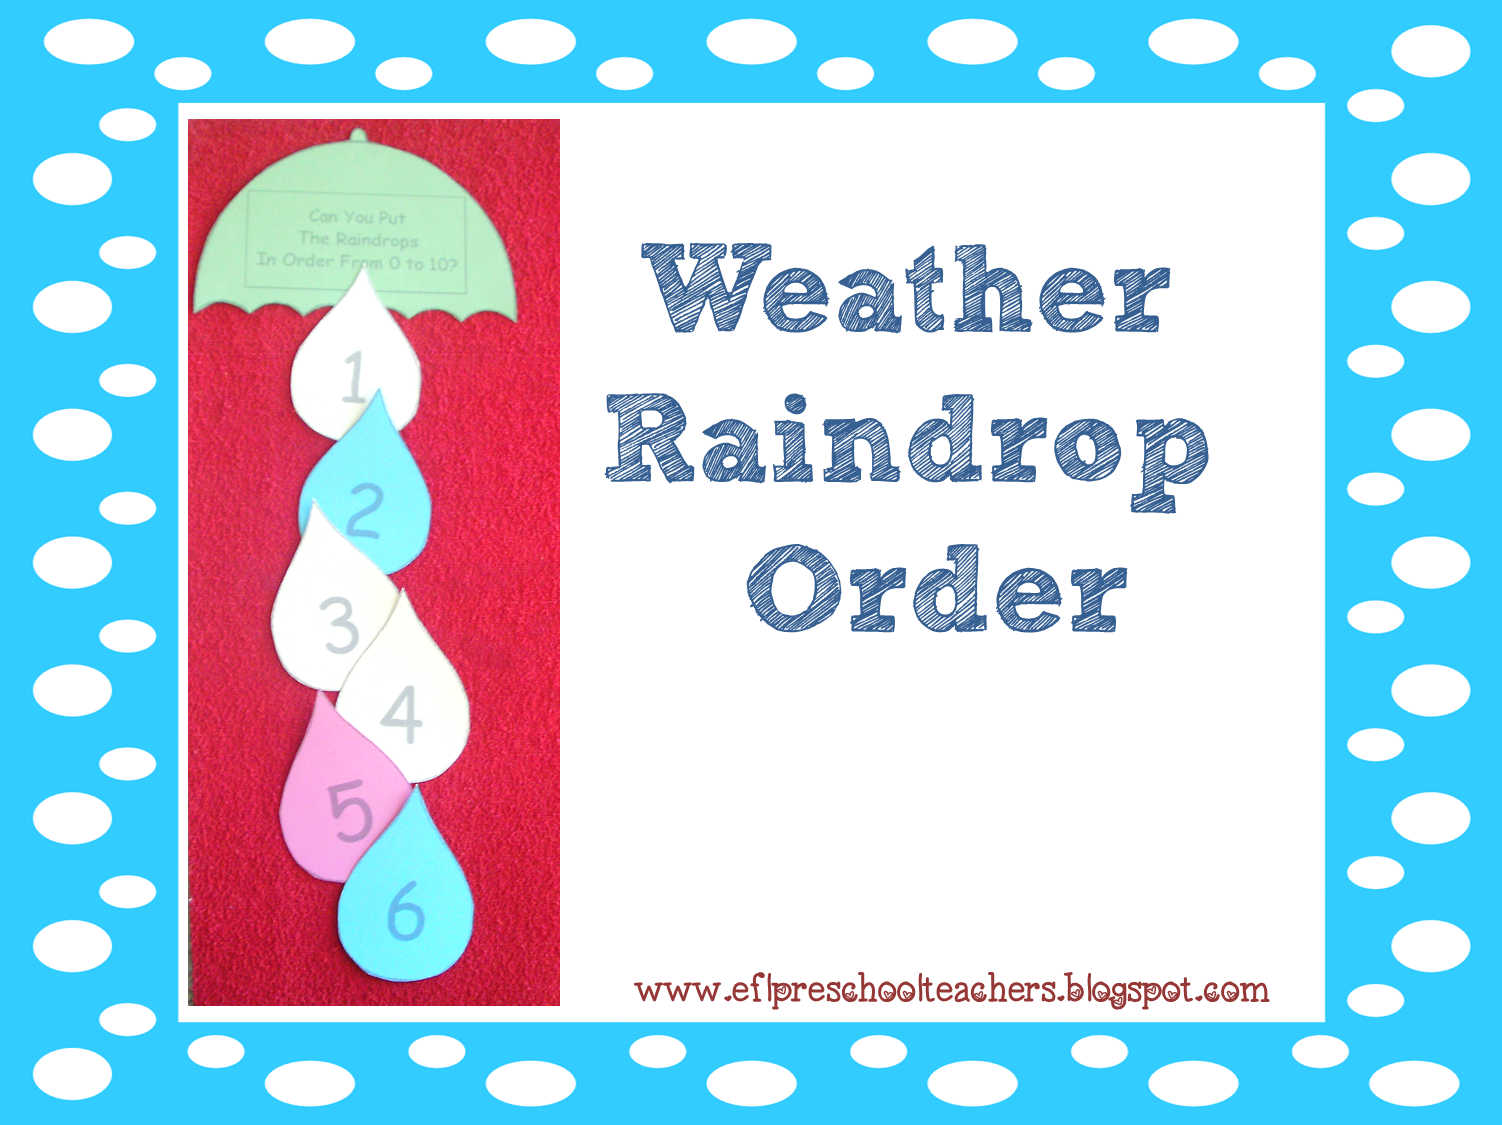 Esl Efl Preschool Teachers Weather Blog